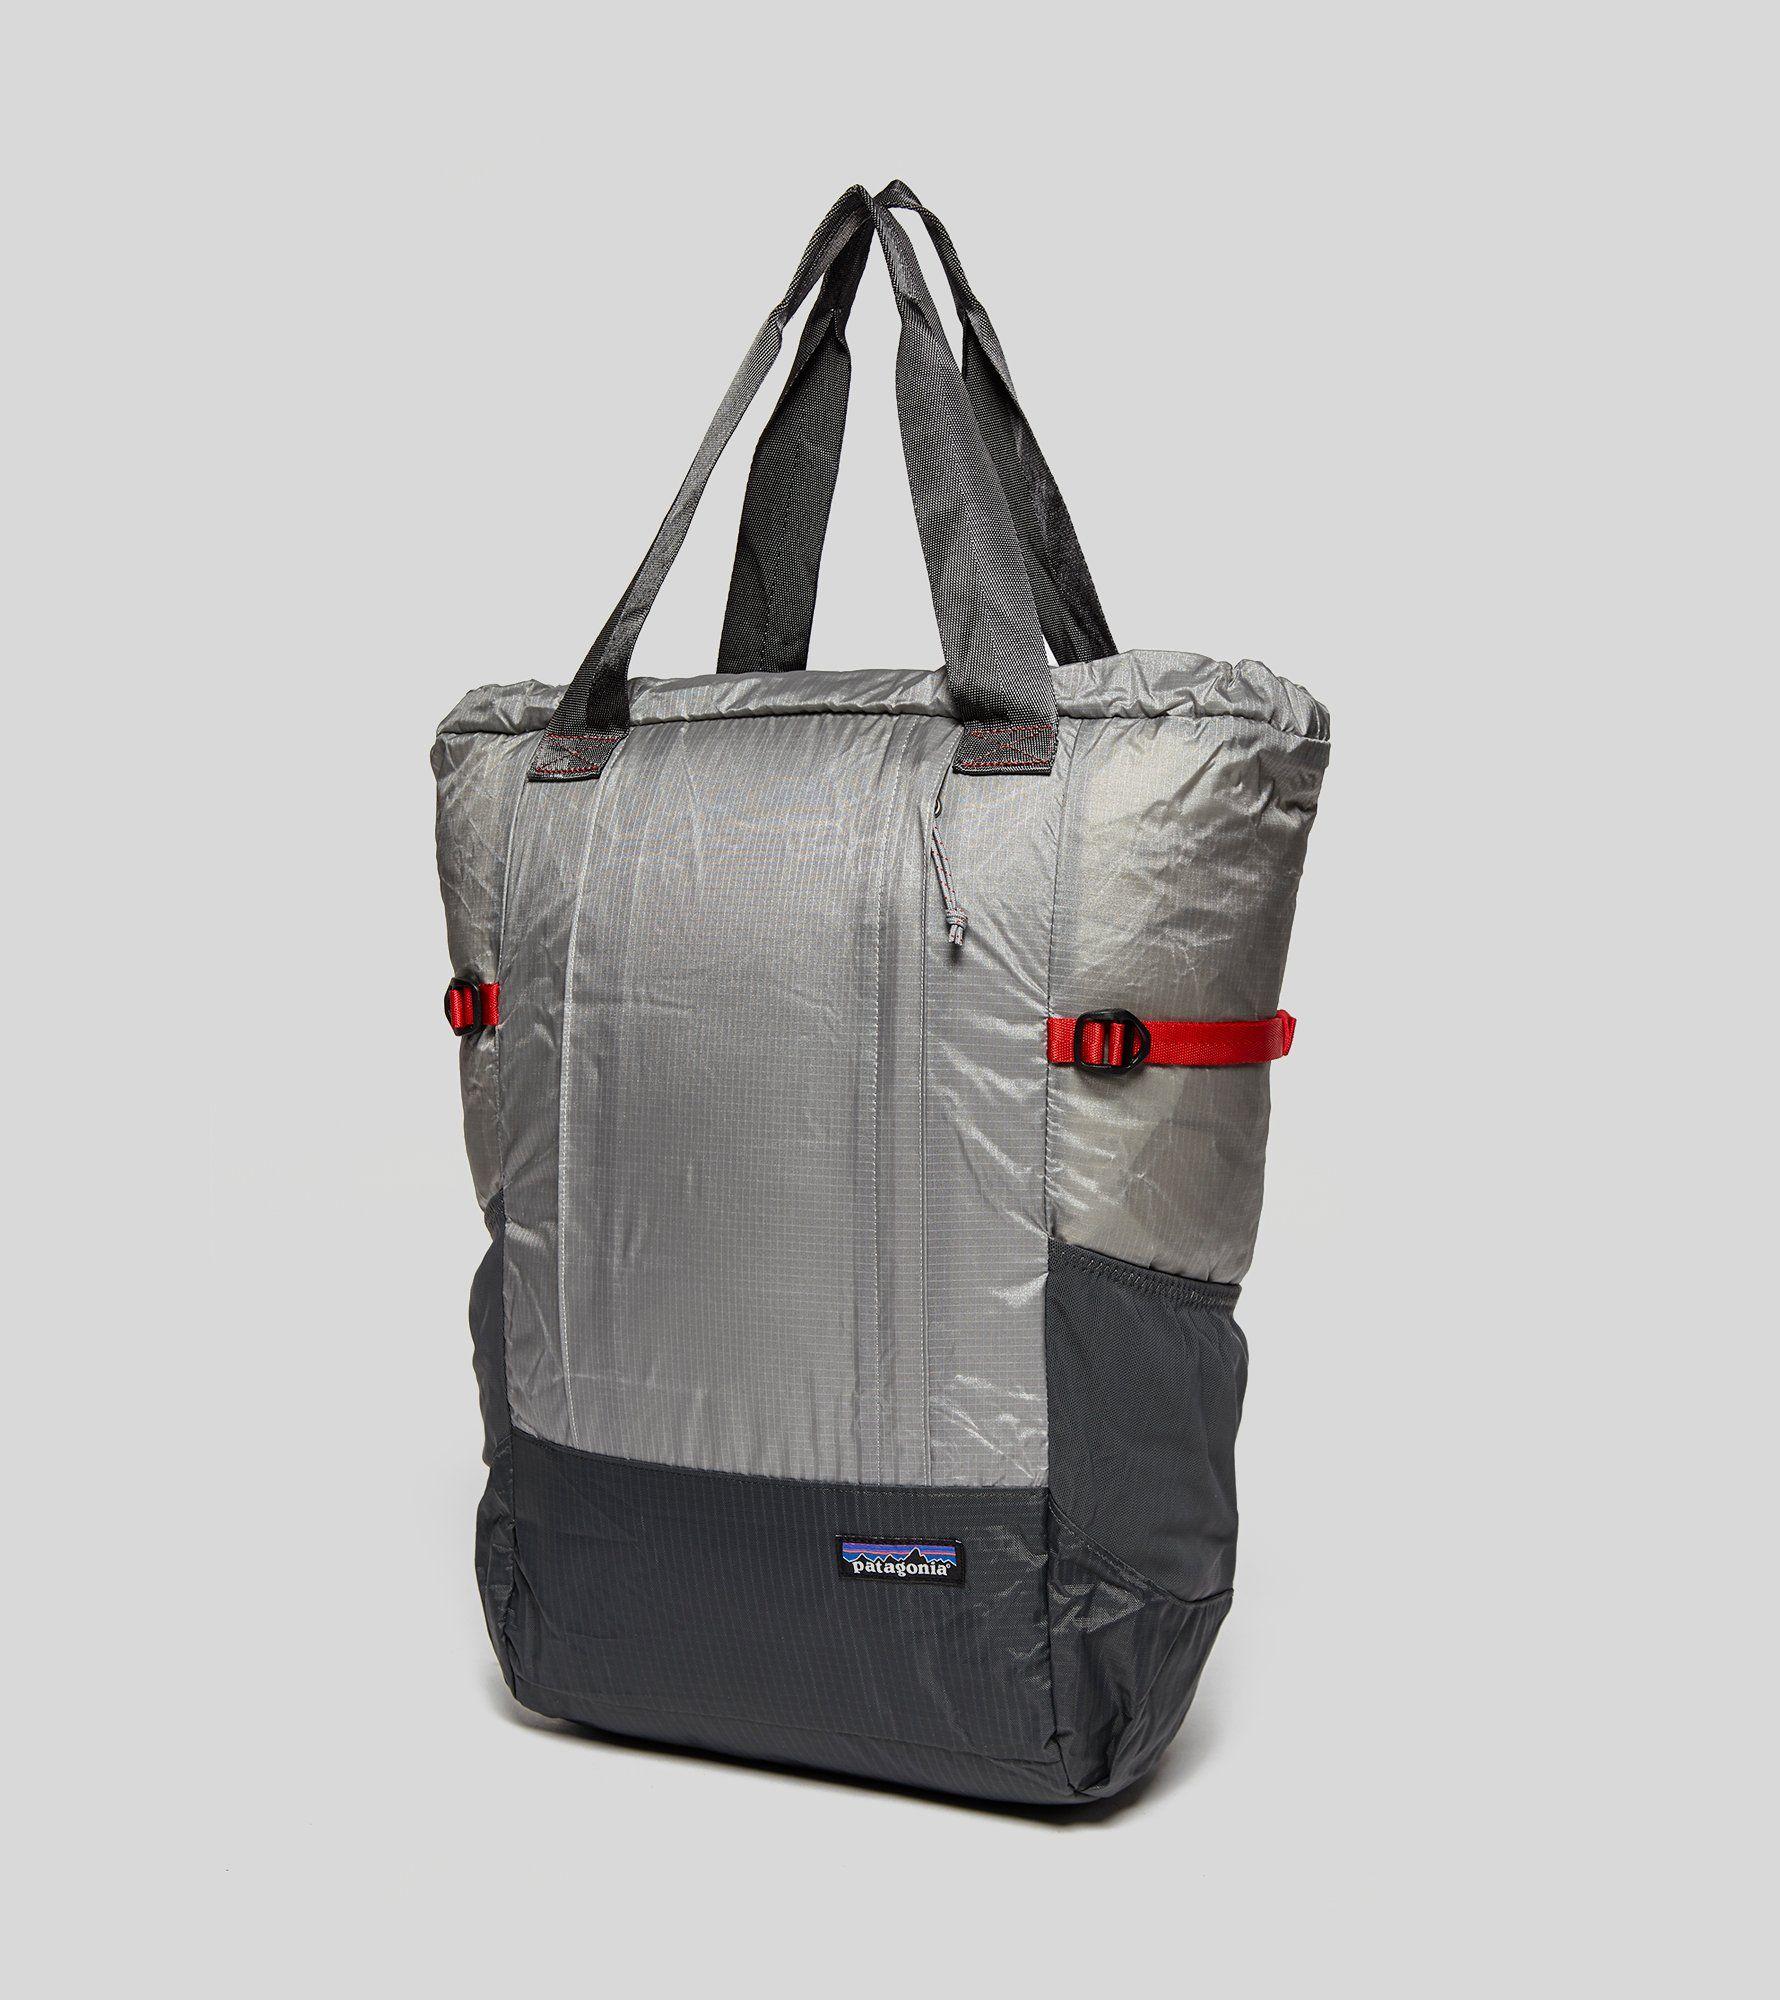 771ec45d414b Patagonia 22l Lightweight Travel Tote Bag Black